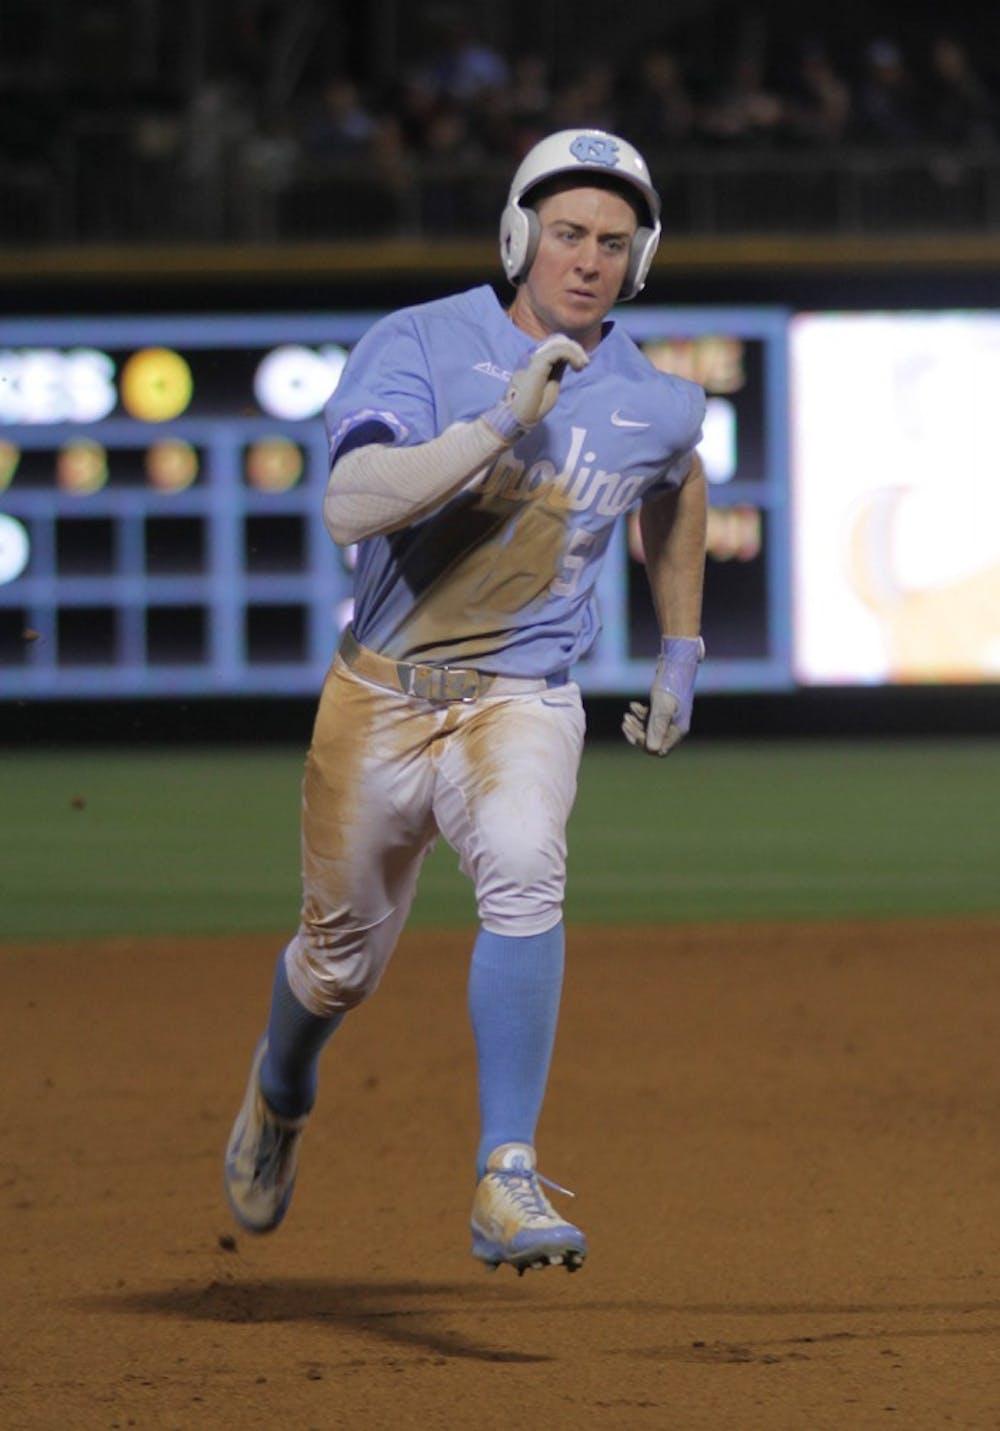 <p>Junior Brian Miller (5) bolts towards home base in UNC baseball's 20-5 win over South Carolina.&nbsp;</p>